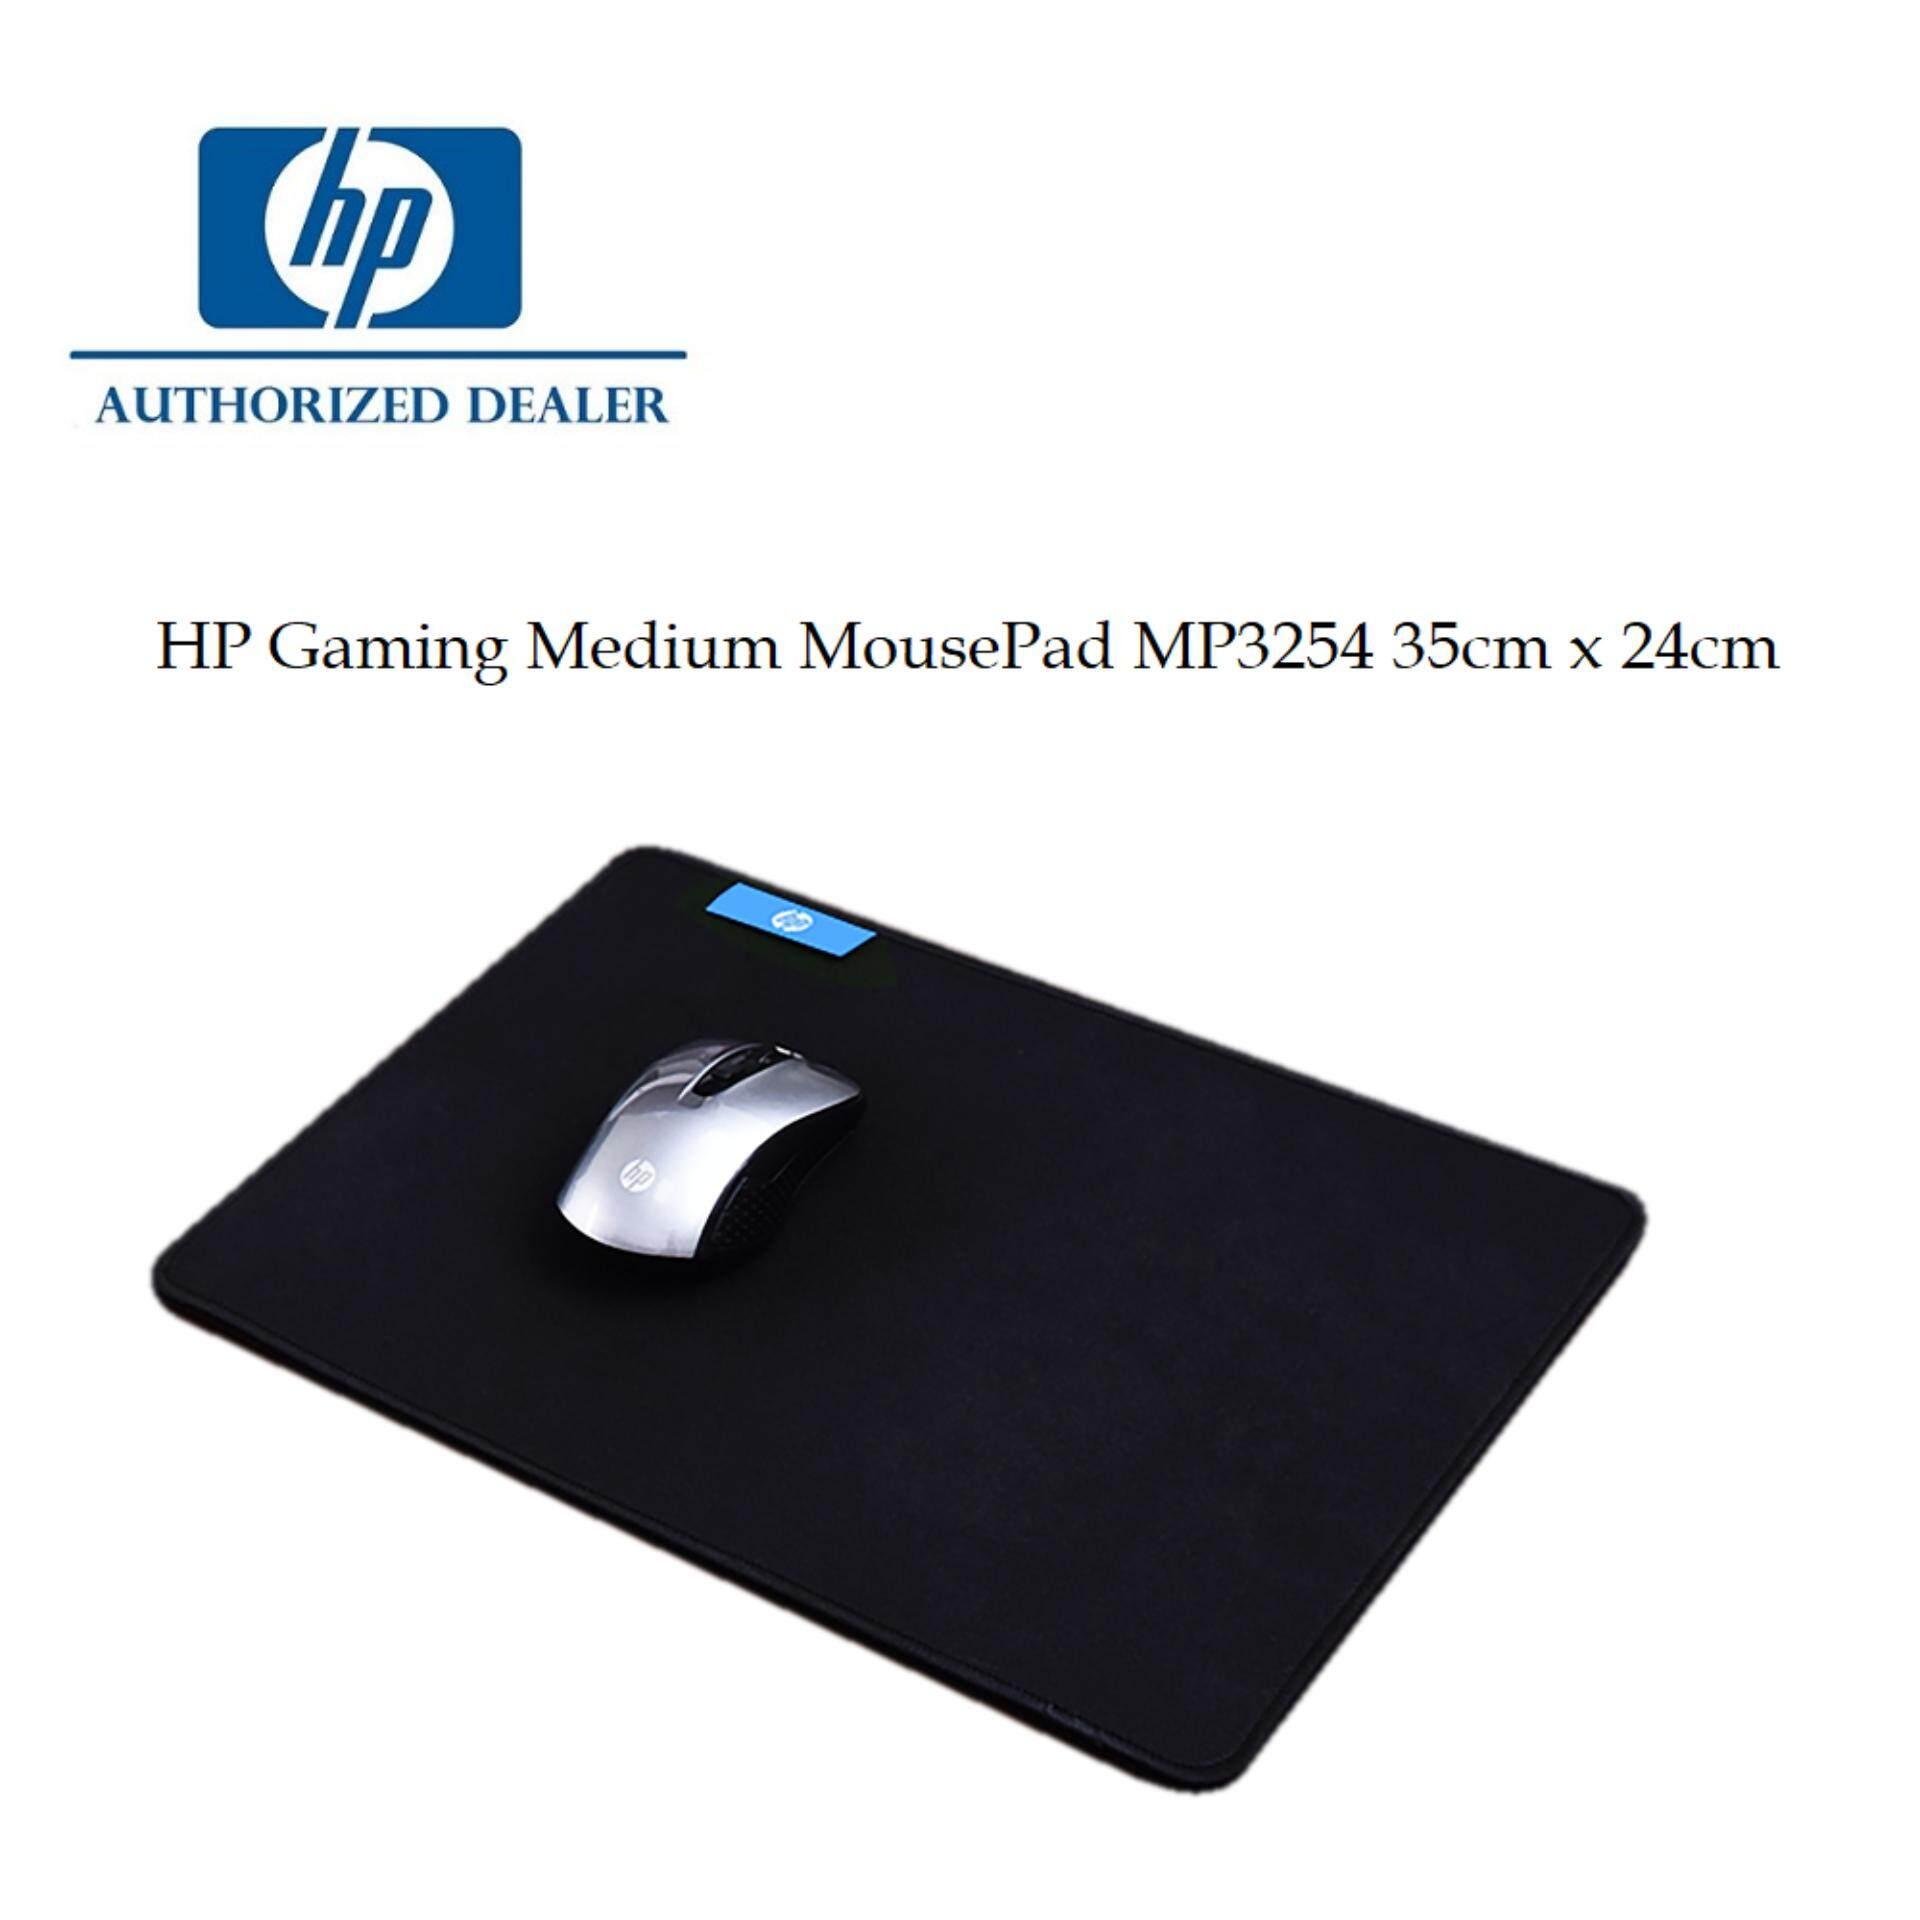 HP Gaming Medium MousePad MP3524 35cm x 24cm